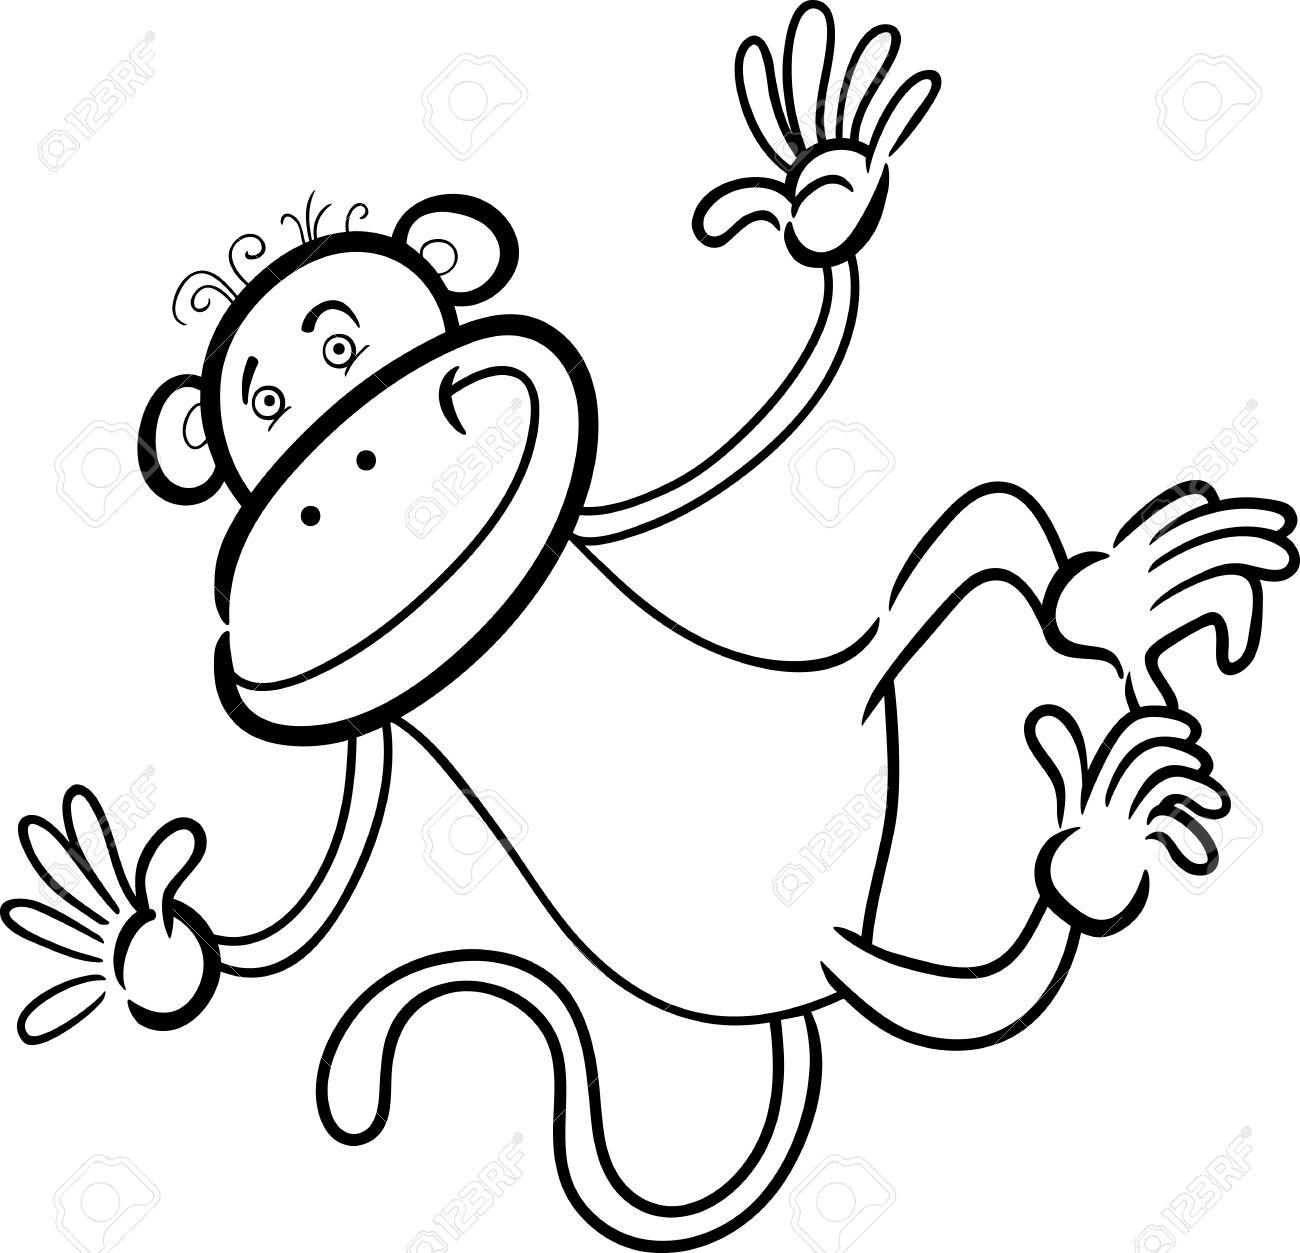 Cartoon Humorvoll Illustration Von Cute Funny Monkey Für Coloring ...